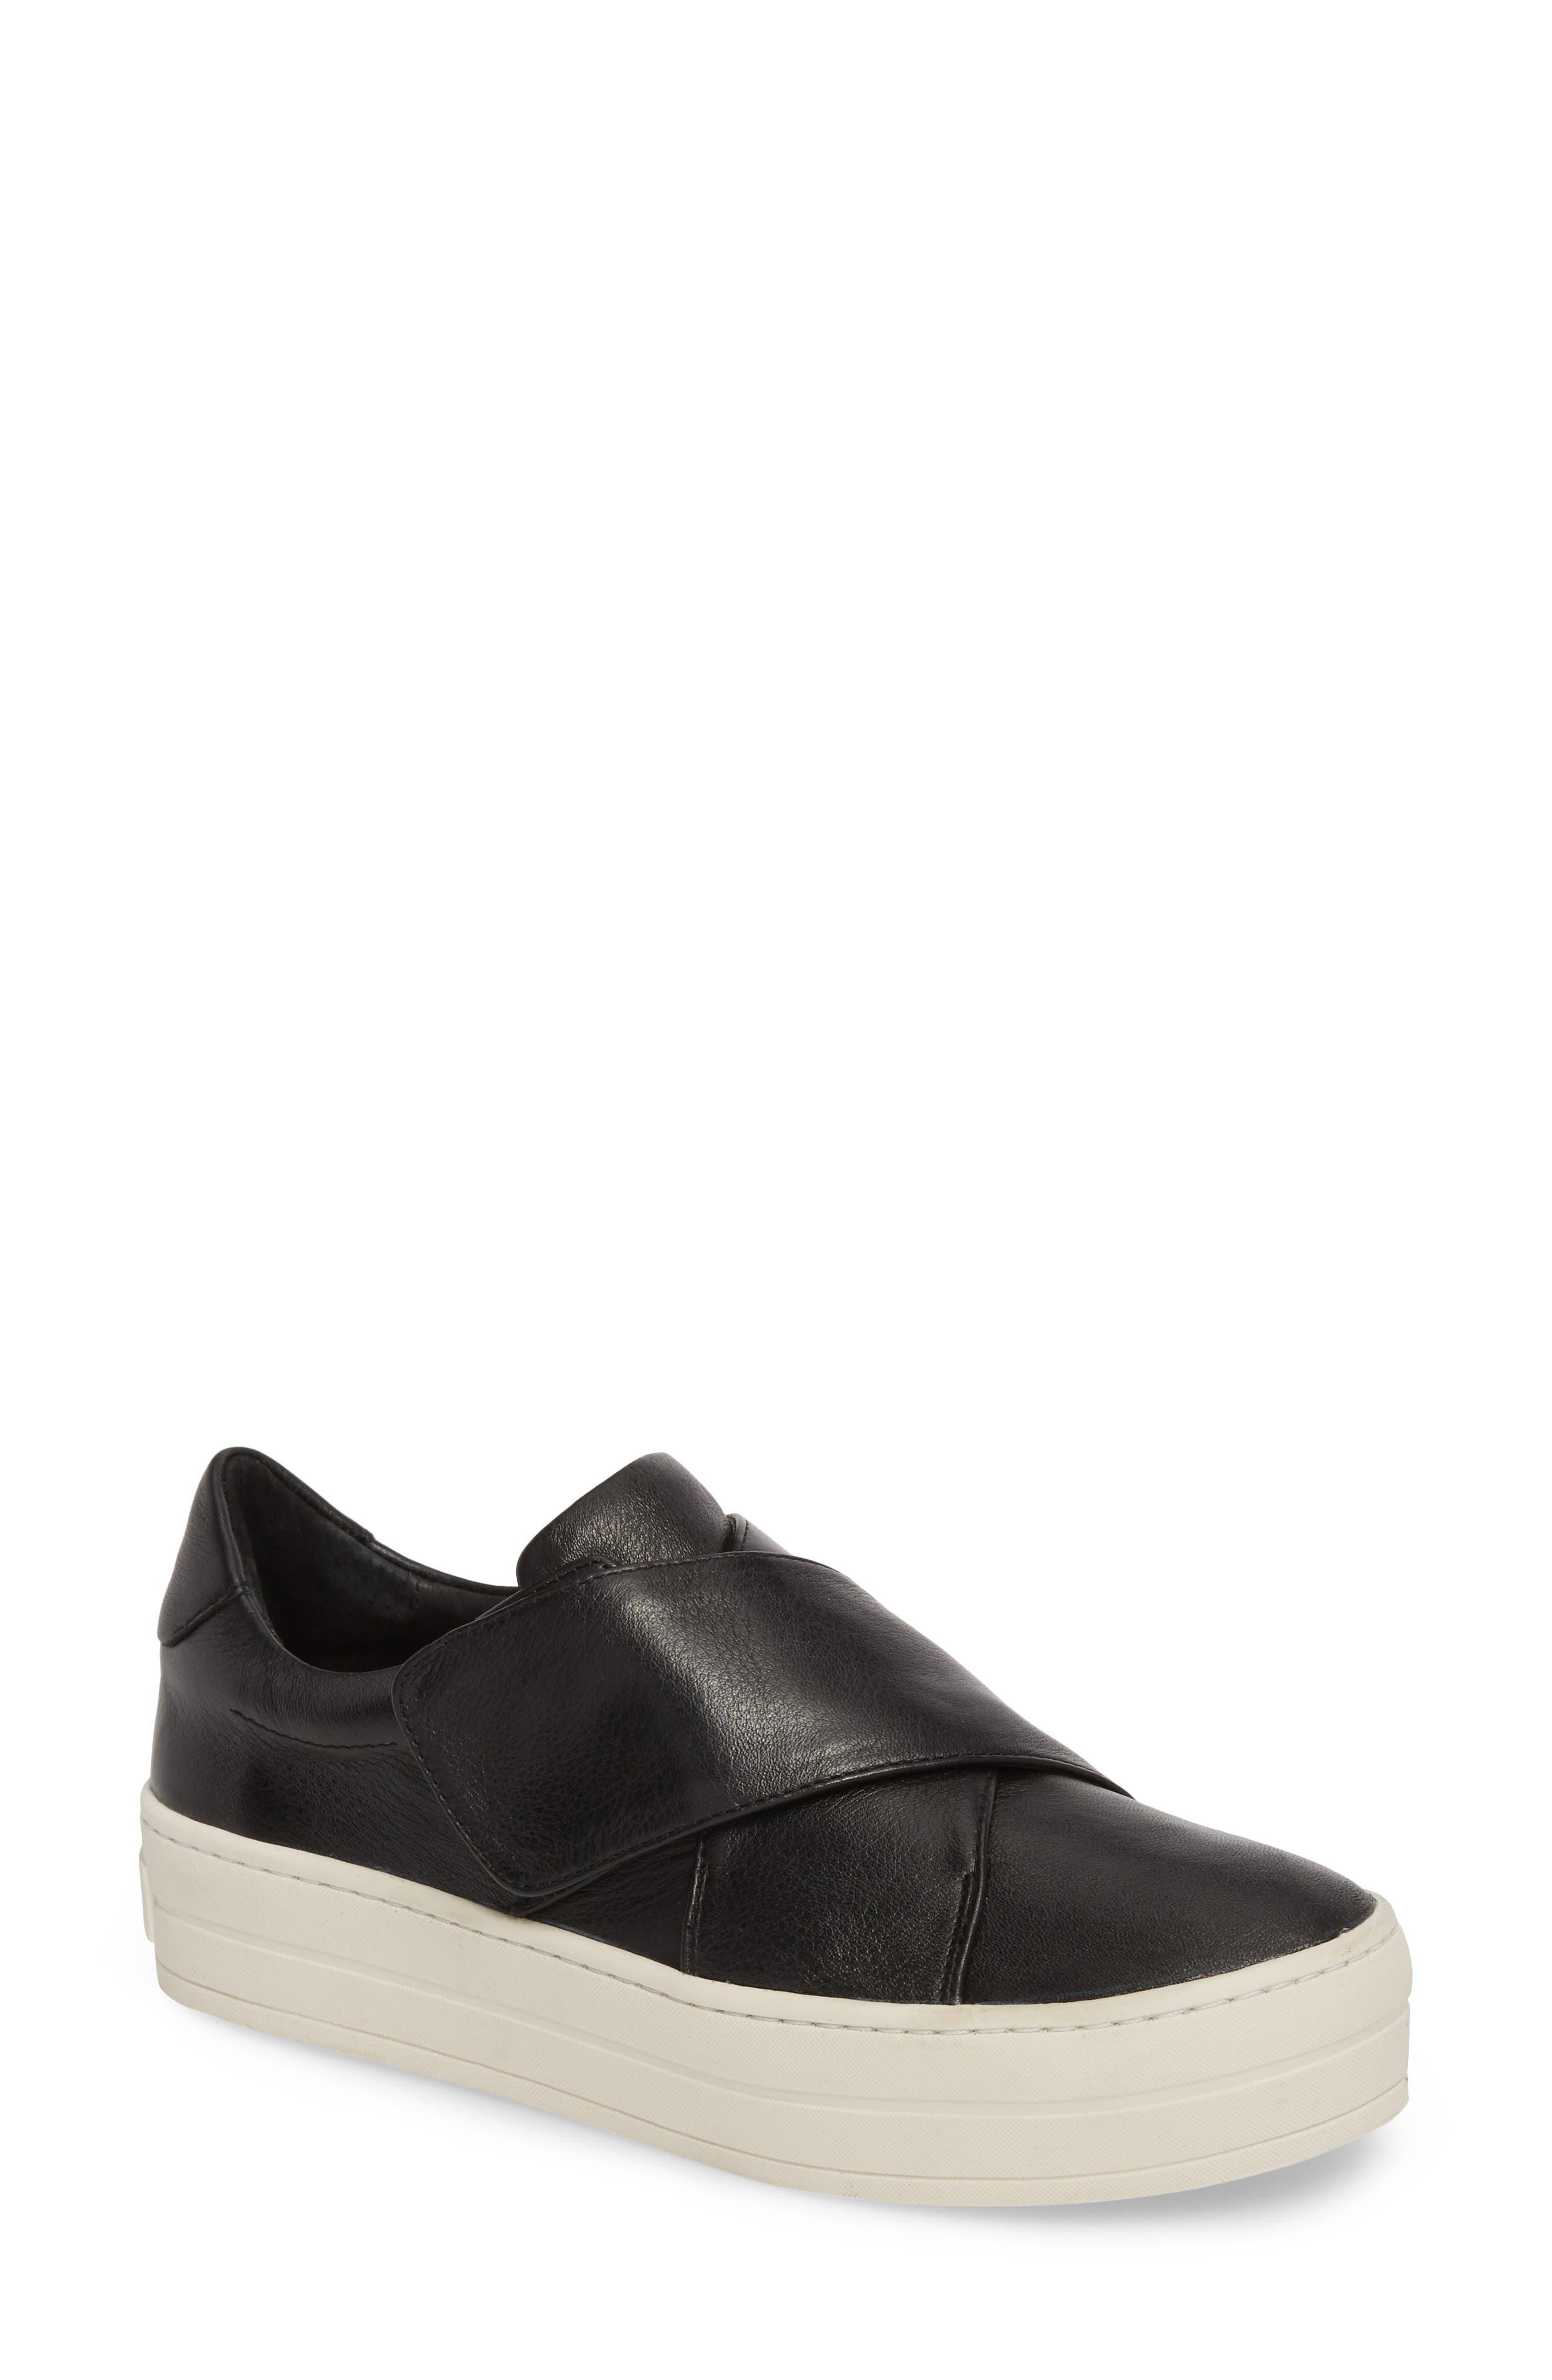 Harper Sneaker,                             Main thumbnail 1, color,                             Black Leather